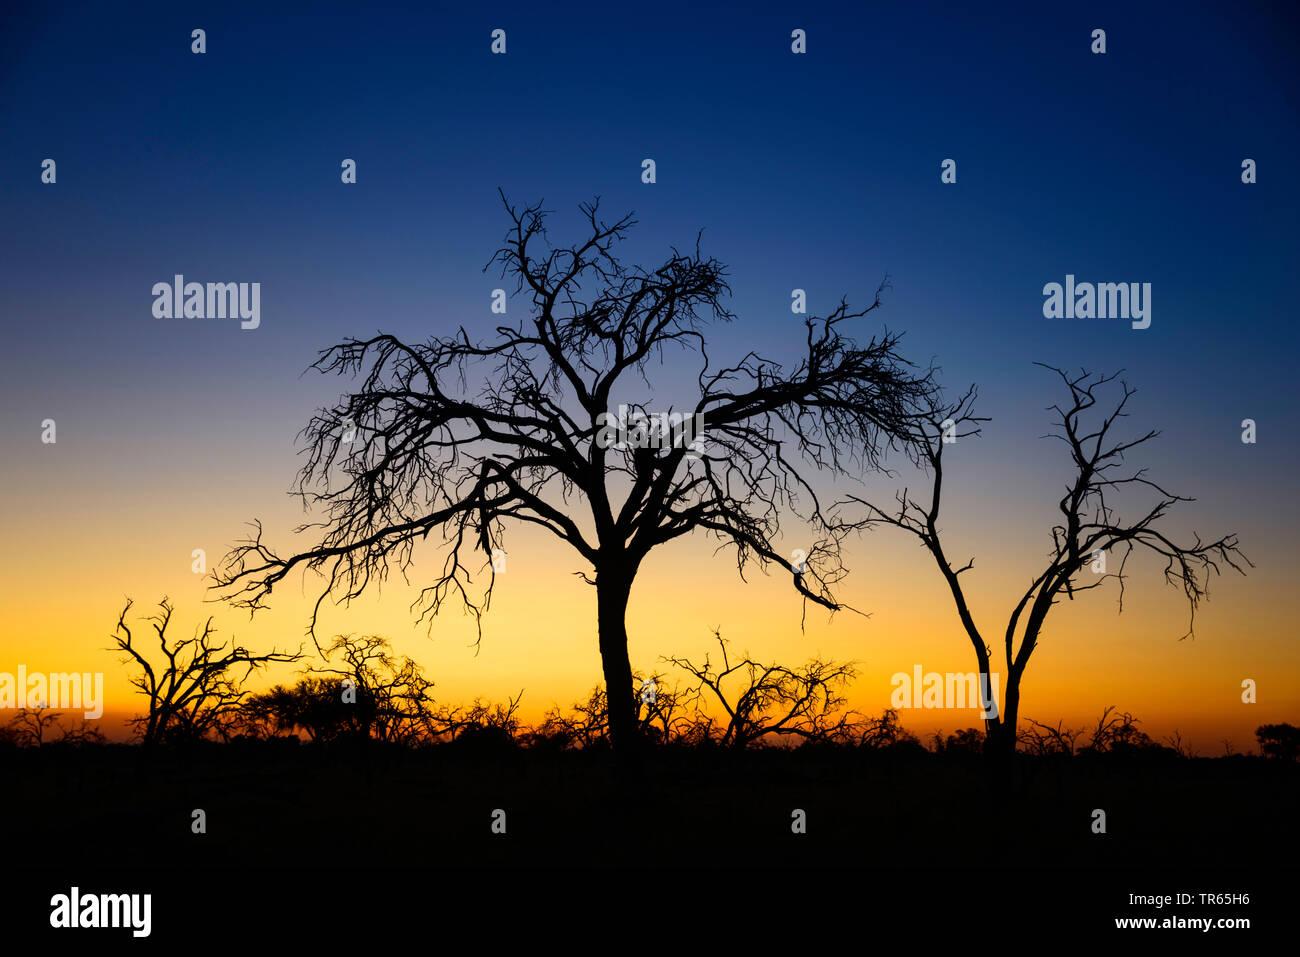 Baum bei Sonnenuntergang nahe Mababe Village, Botswana , Mbabe Village   tree at sunset, Botswana , Mbabe Village   BLWS474229.jpg [ (c) blickwinkel/M - Stock Image